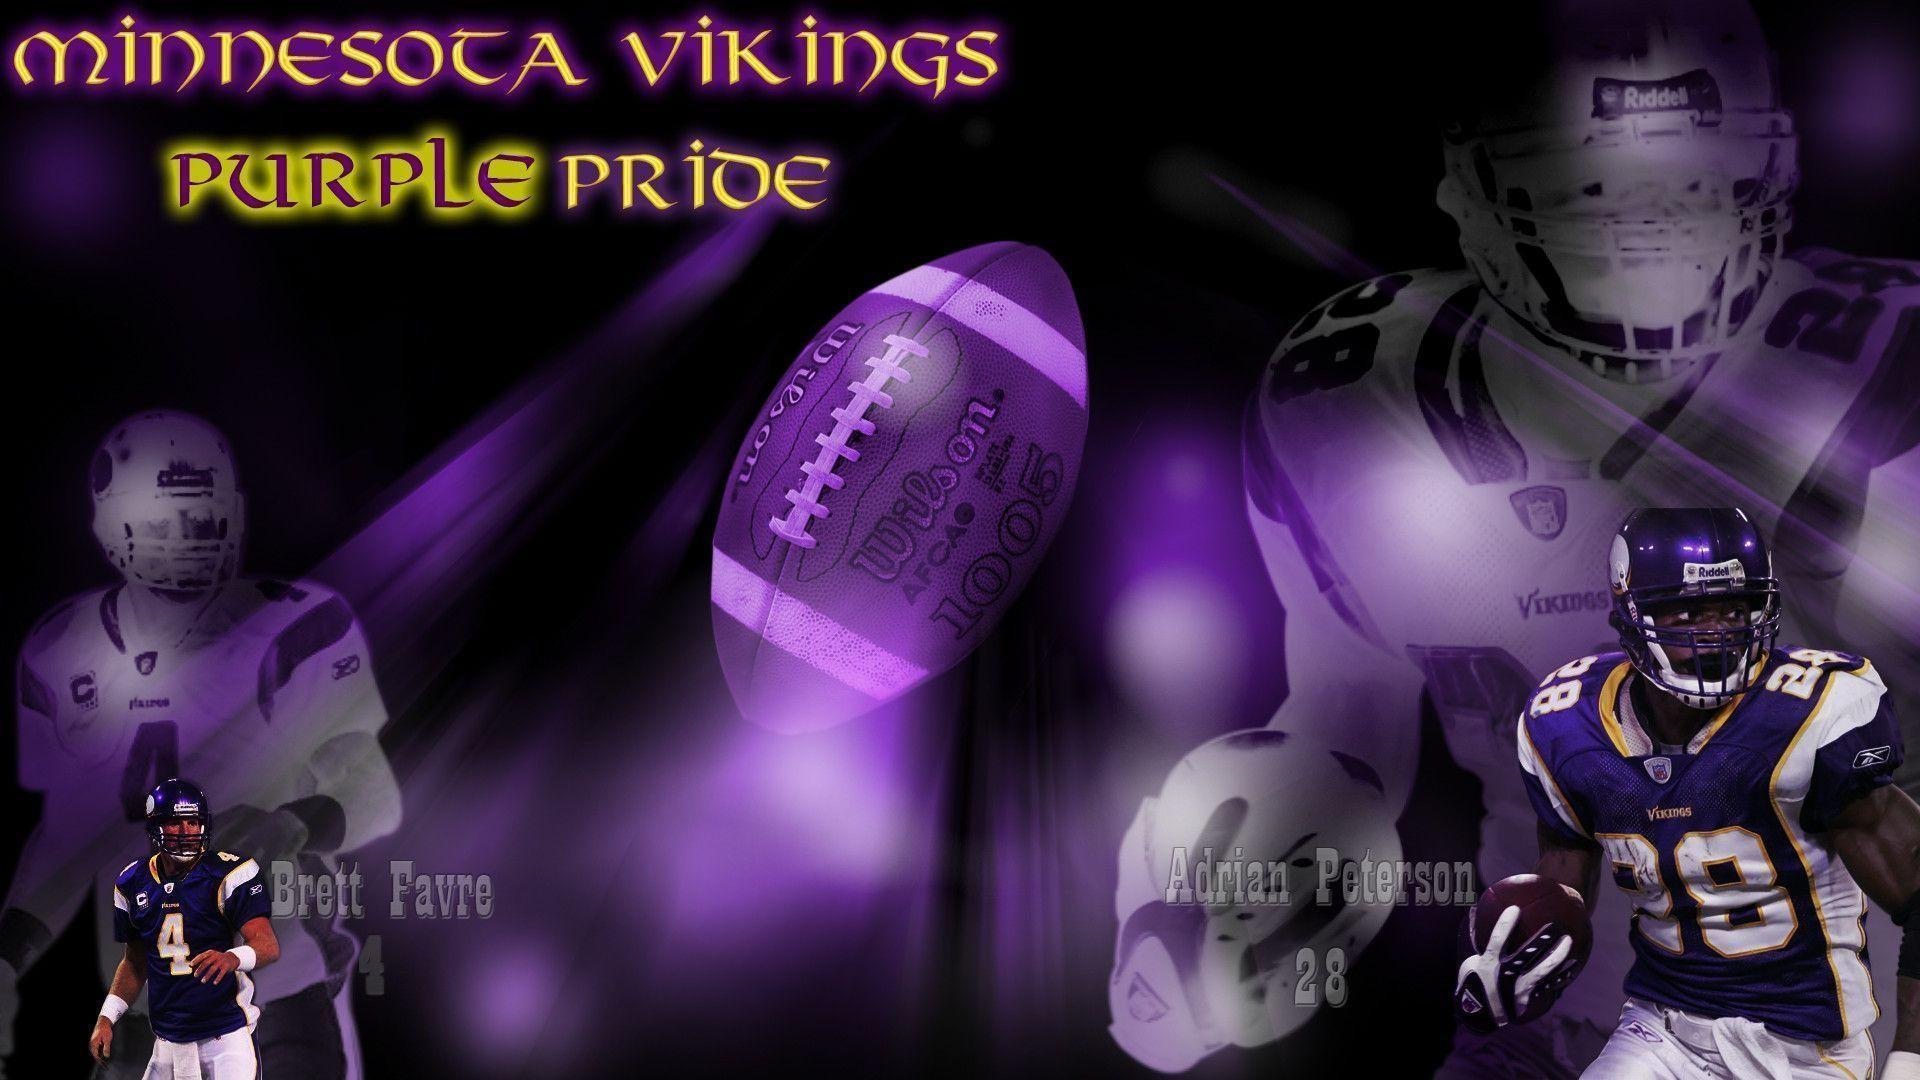 1920x1200 Adrian Peterson Minnesota Vikings Wallpaper